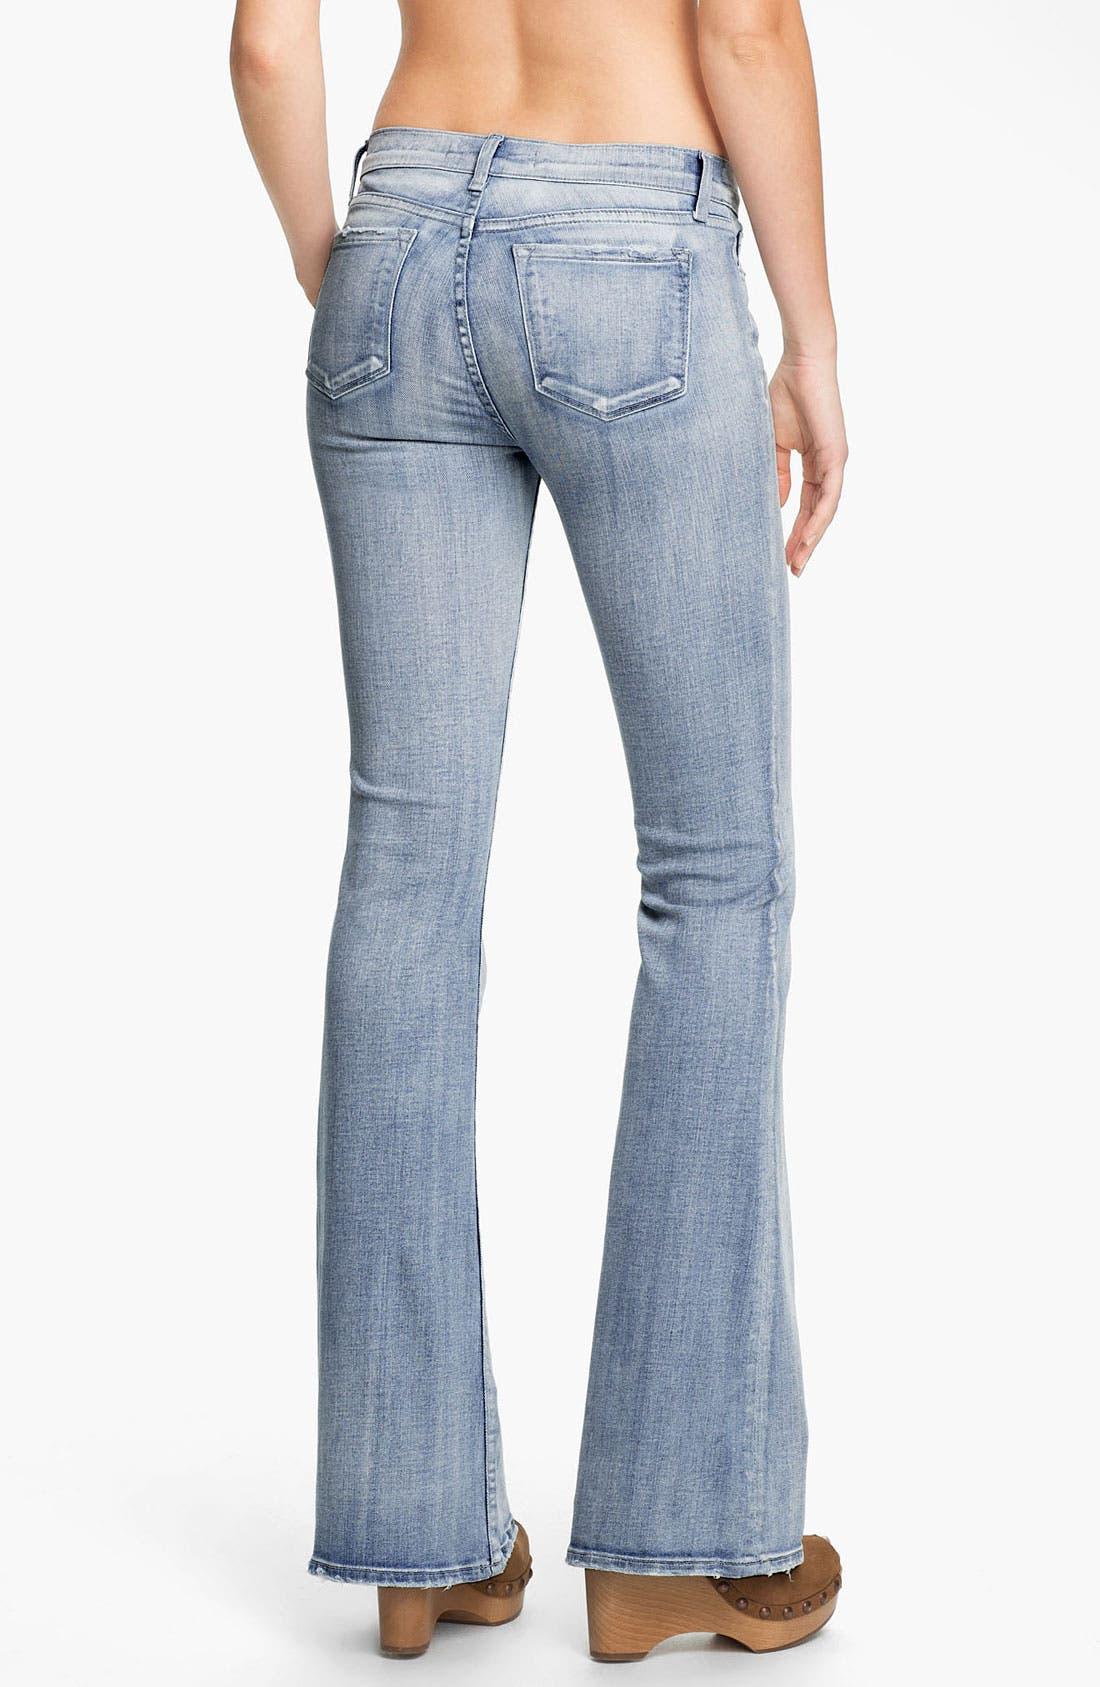 Alternate Image 2  - J Brand 'Babe' Flare Leg Jeans (Afterlife)